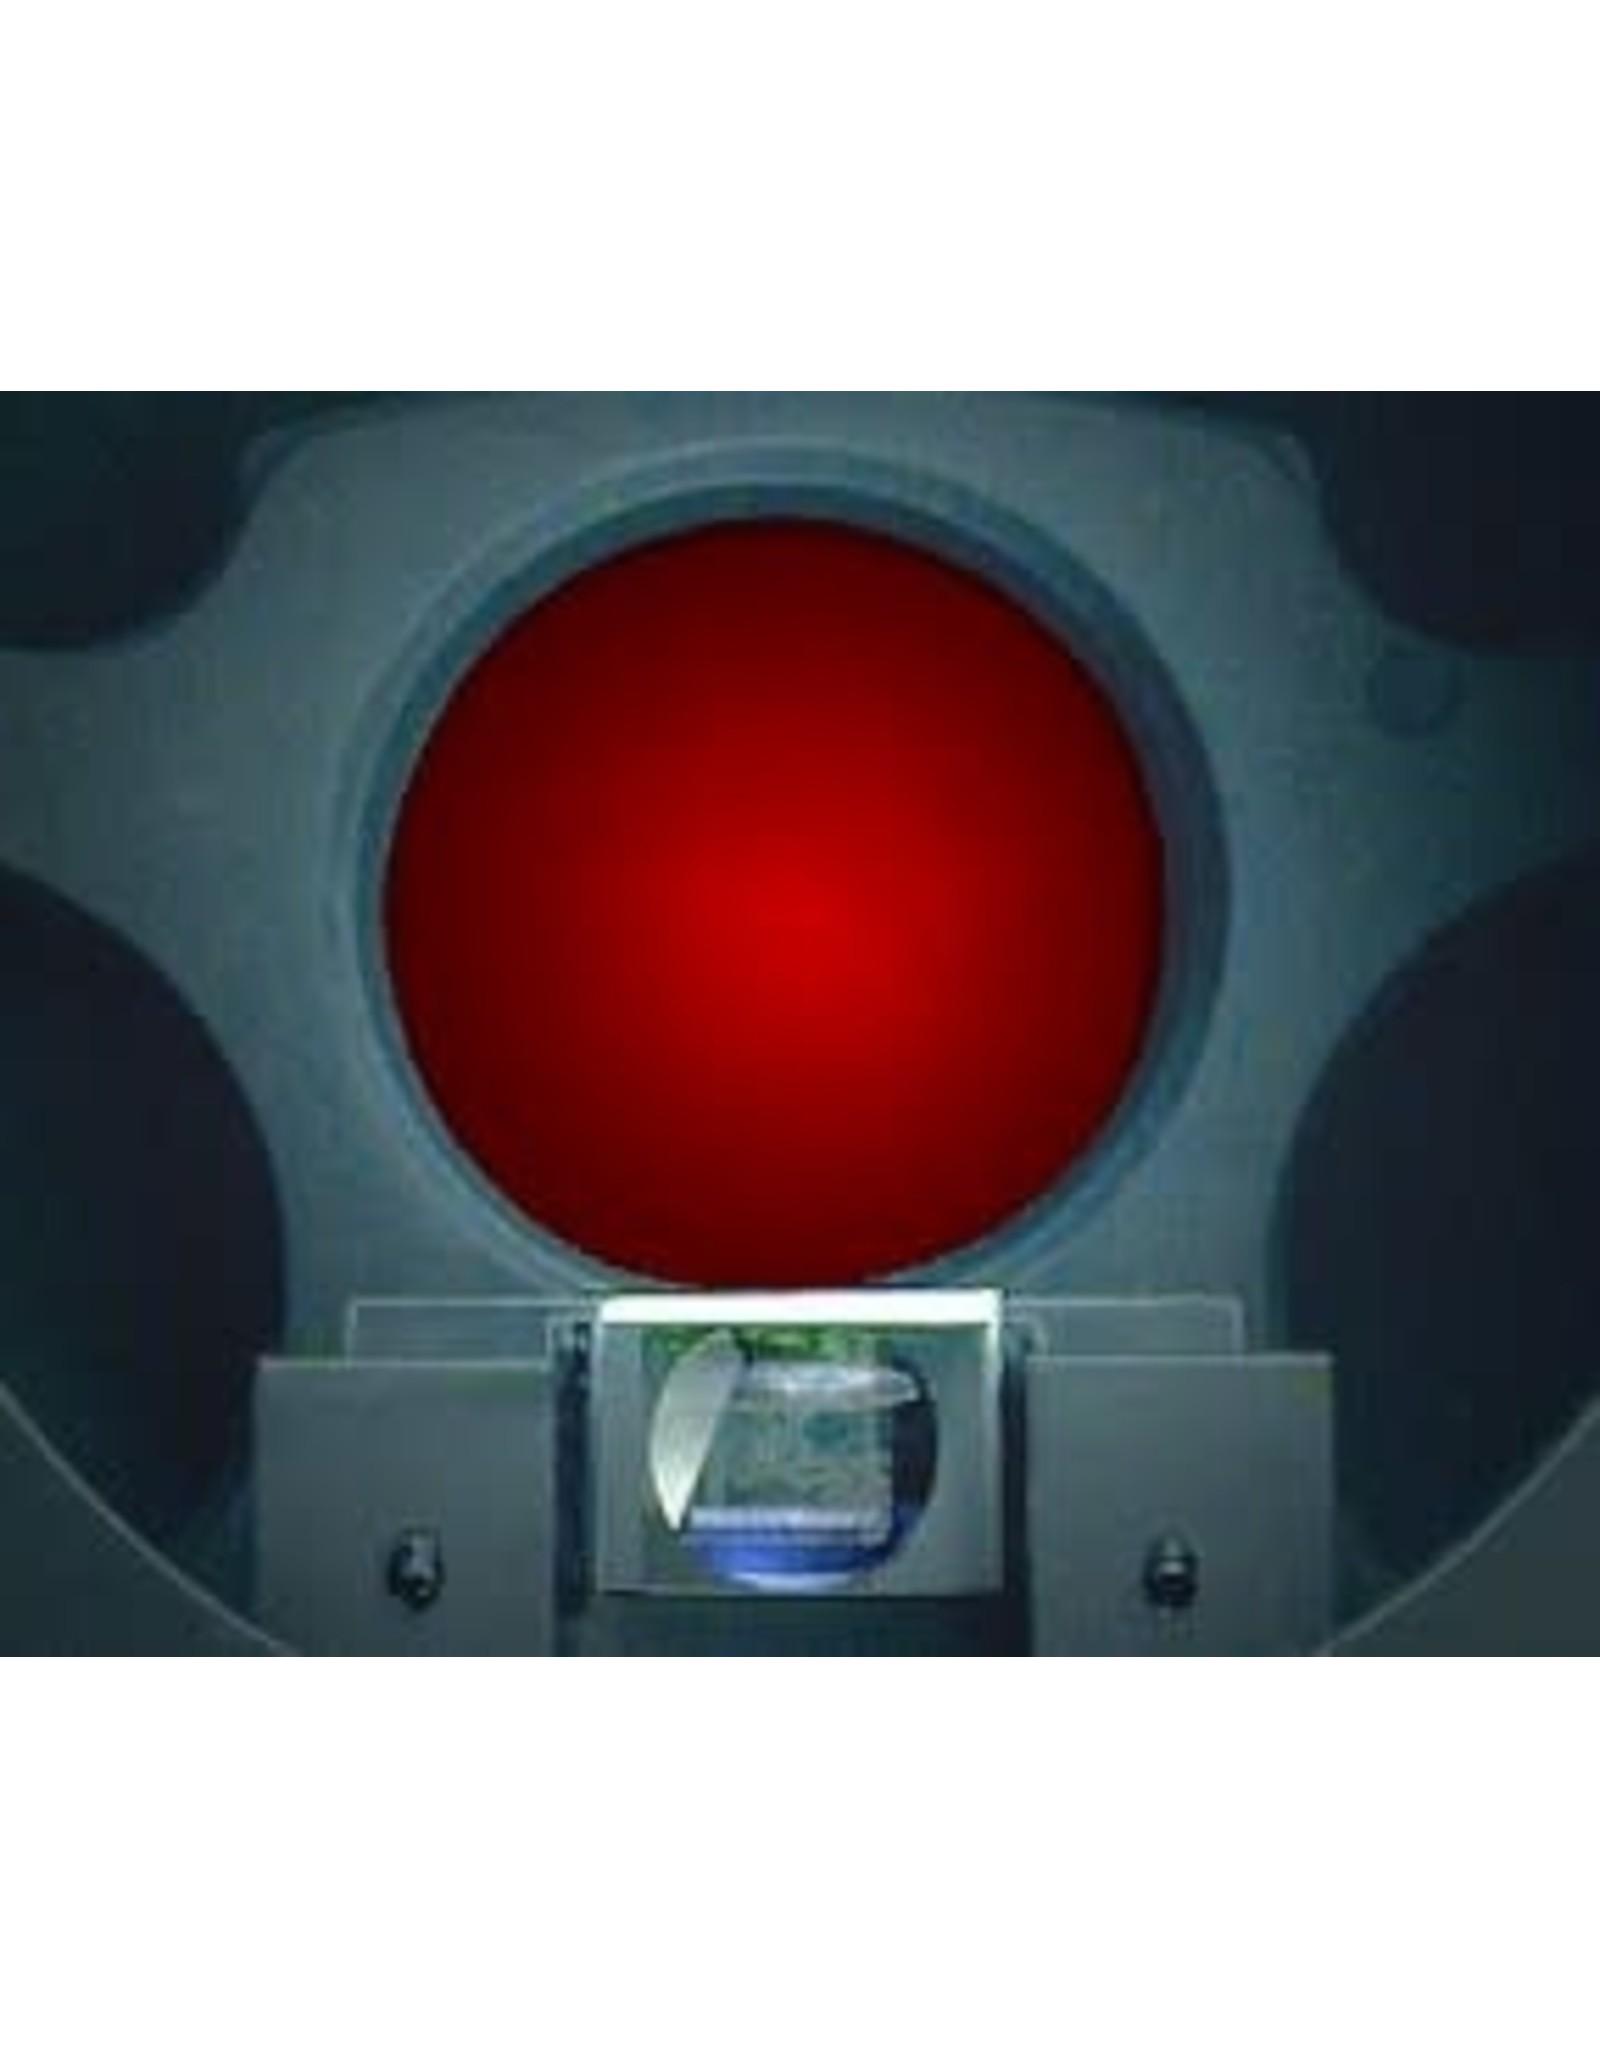 SBIG Aluma CCD694 / FW8S / SC-2 Package